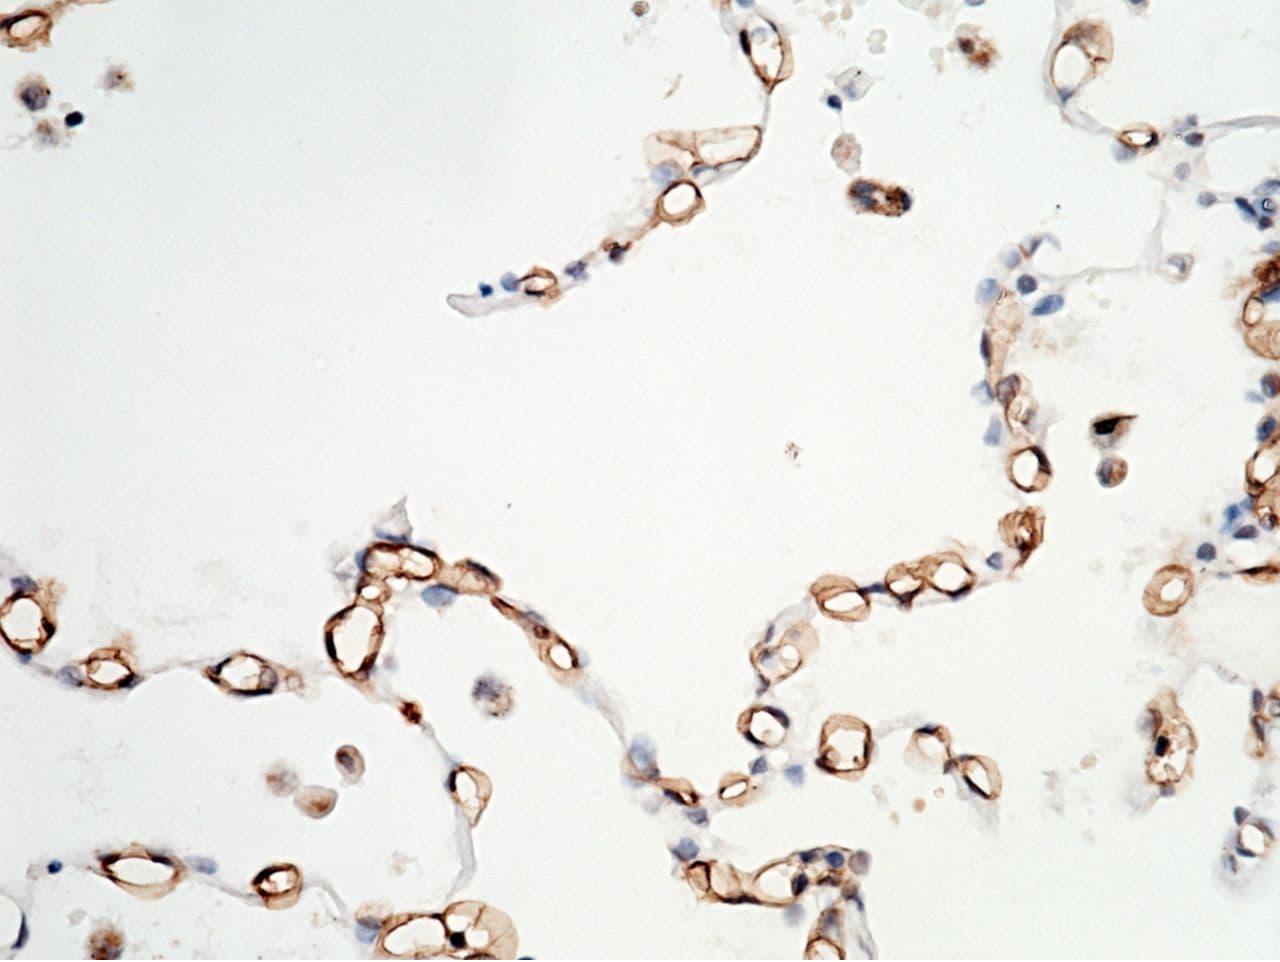 Carbonic Anhydrase IV Antibody in Immunohistochemistry (Paraffin) (IHC (P))